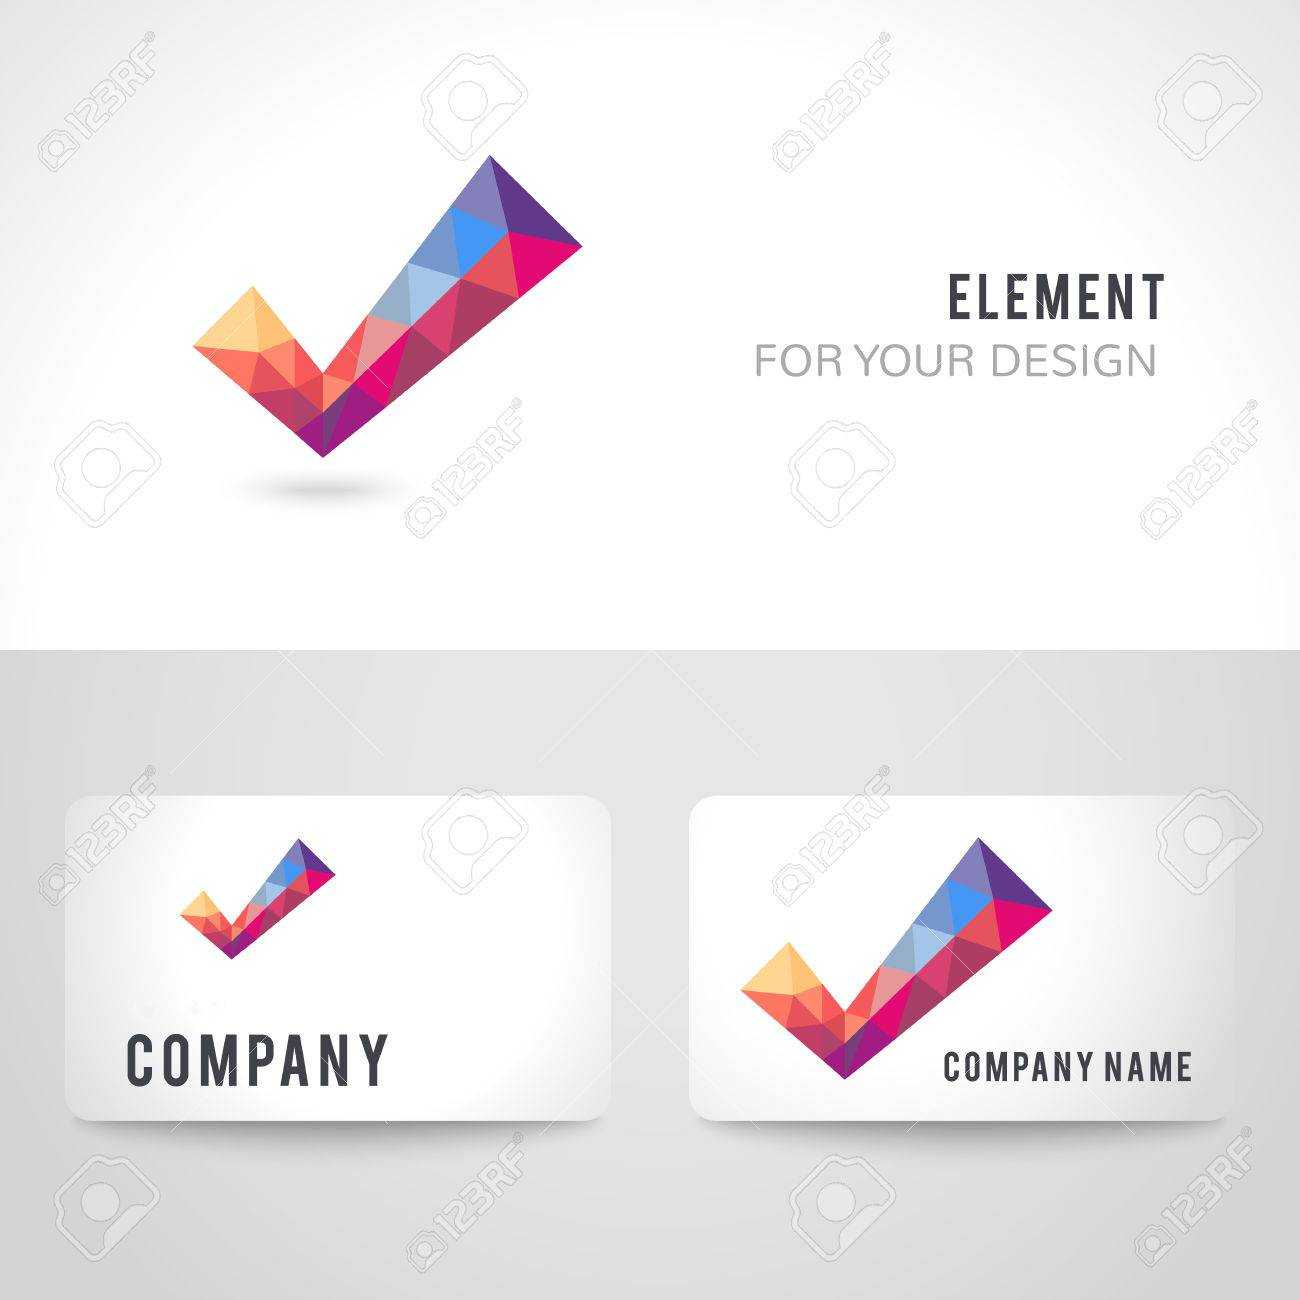 Acceptance Card Template - Calep.midnightpig.co Regarding Acceptance Card Template